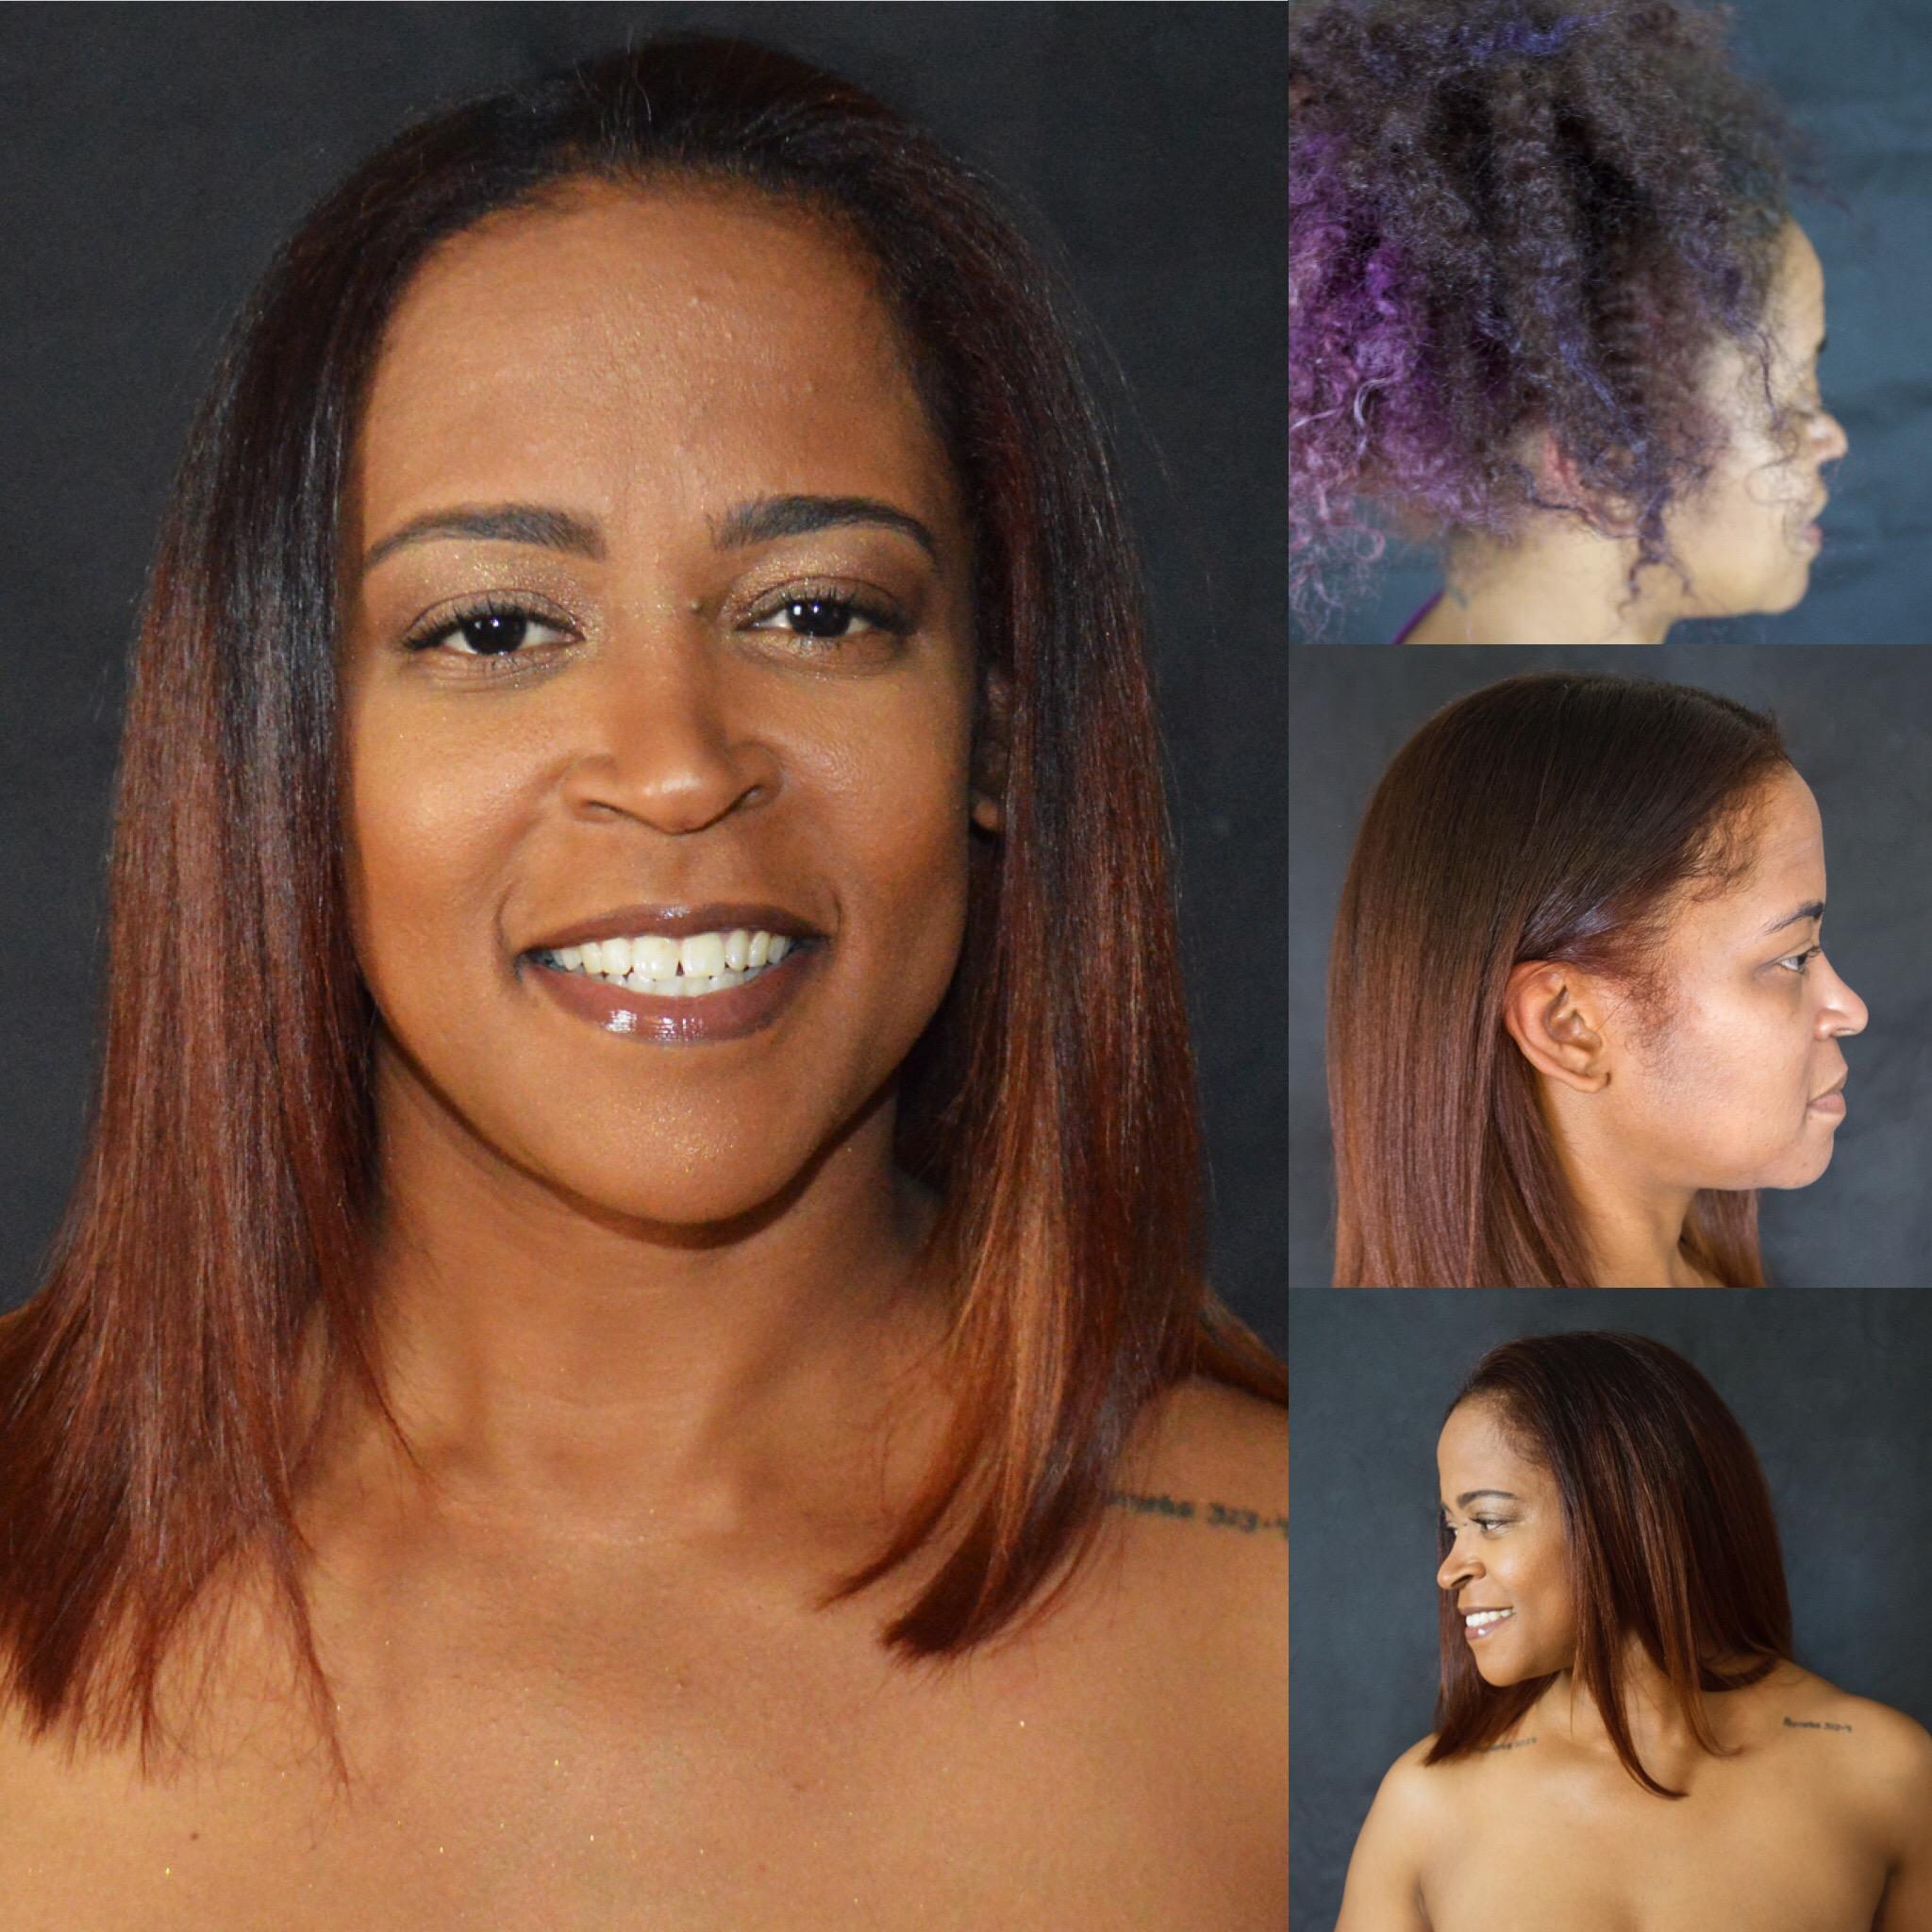 Product Used - Pravana: Pure Light Cream LightenerPravana: Chroma Silk Permanent Hair ColorFor Professional Use Only